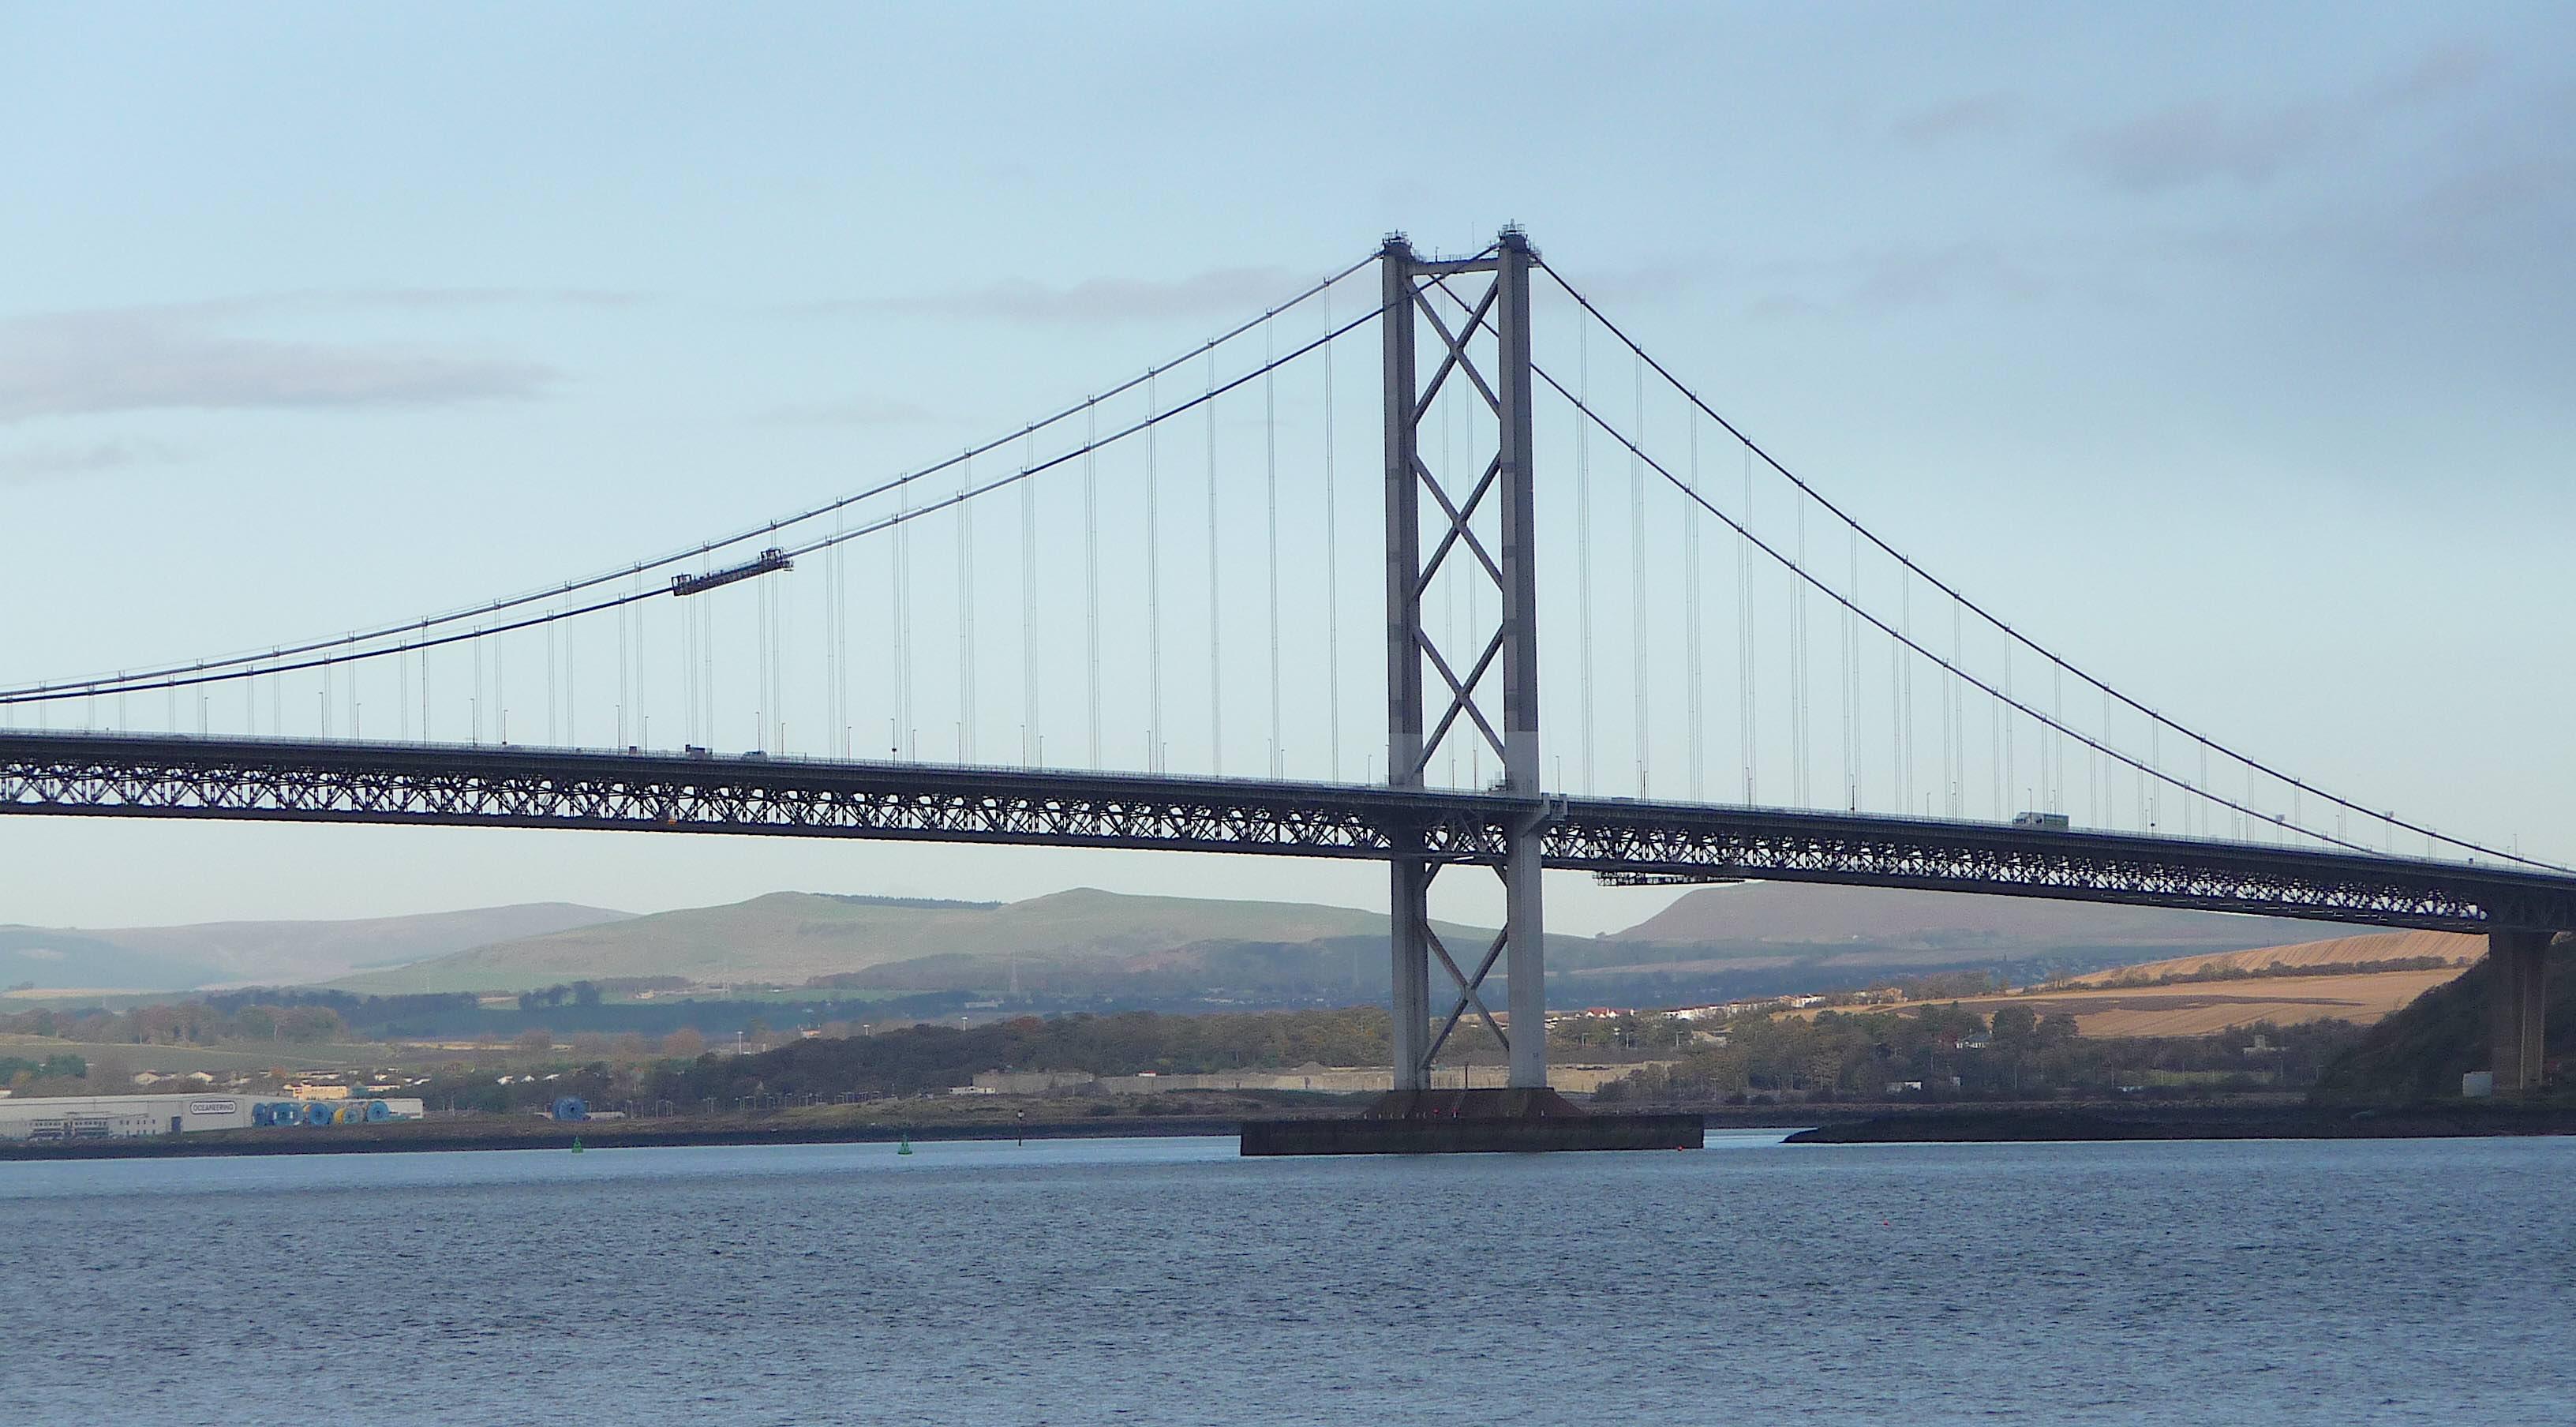 33.Forth Road Bridge